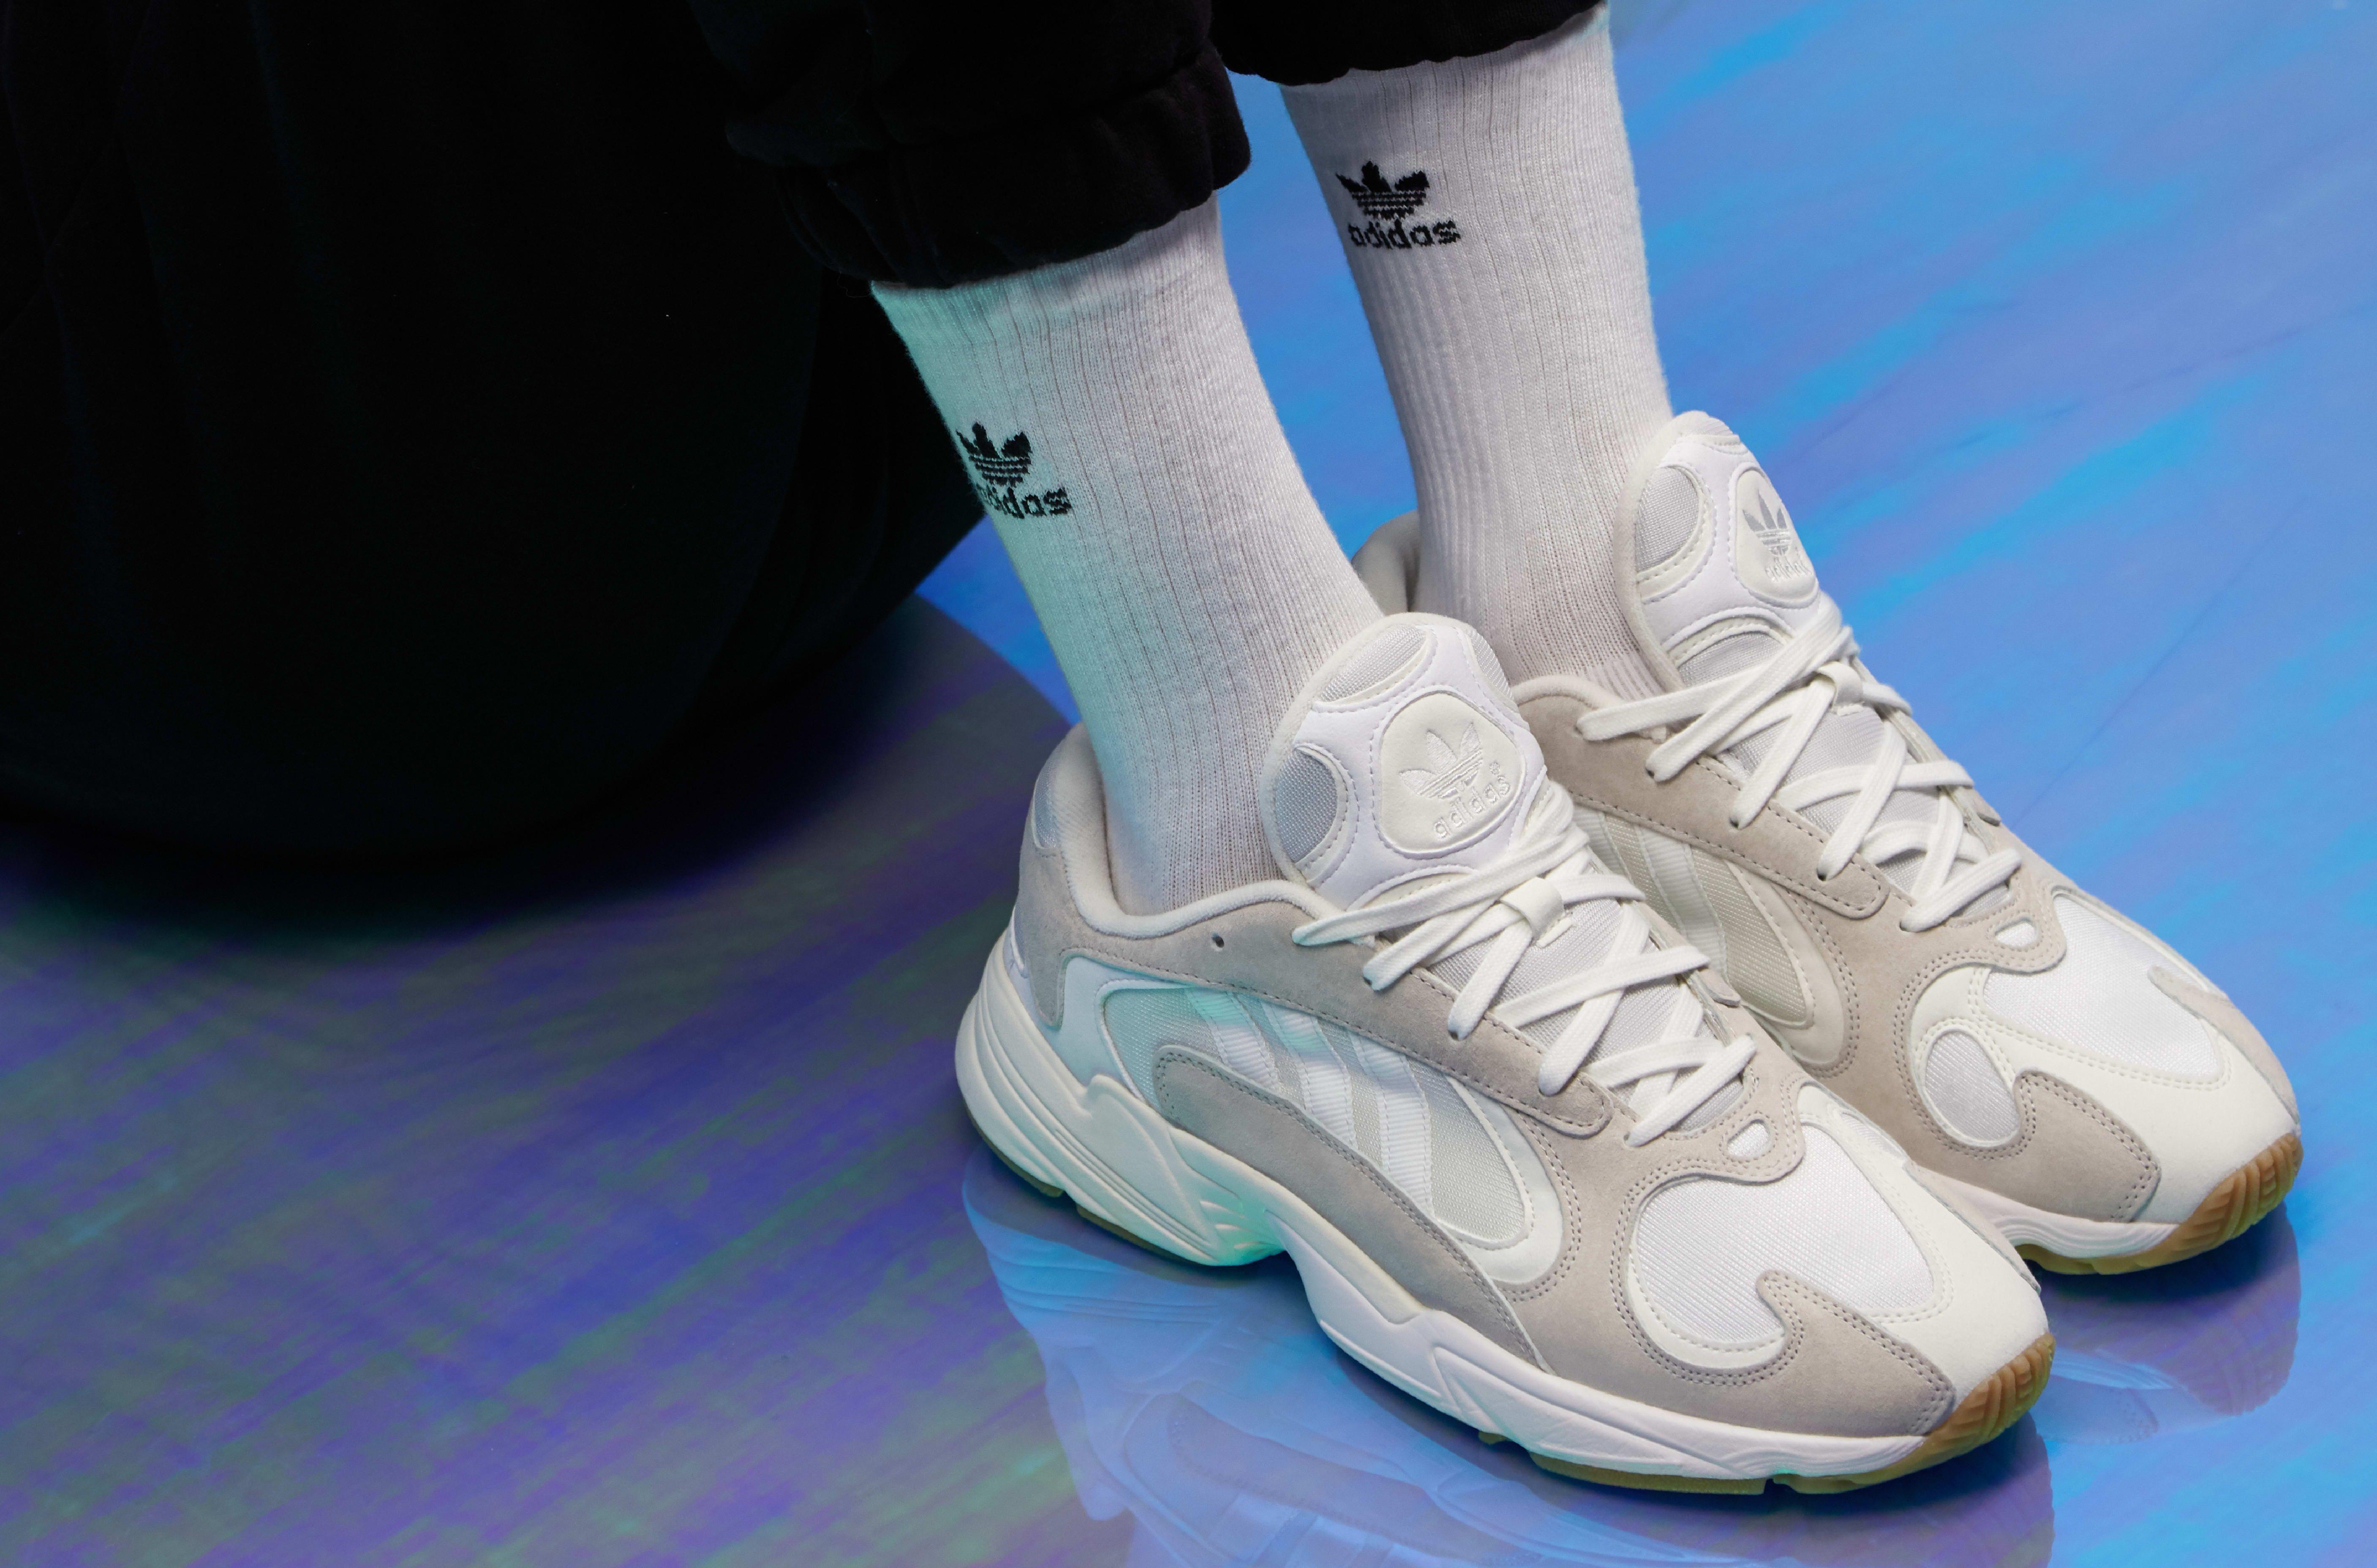 Wardrobe.NYC x Adidas Yung 1 Bundle Release Date   Sole